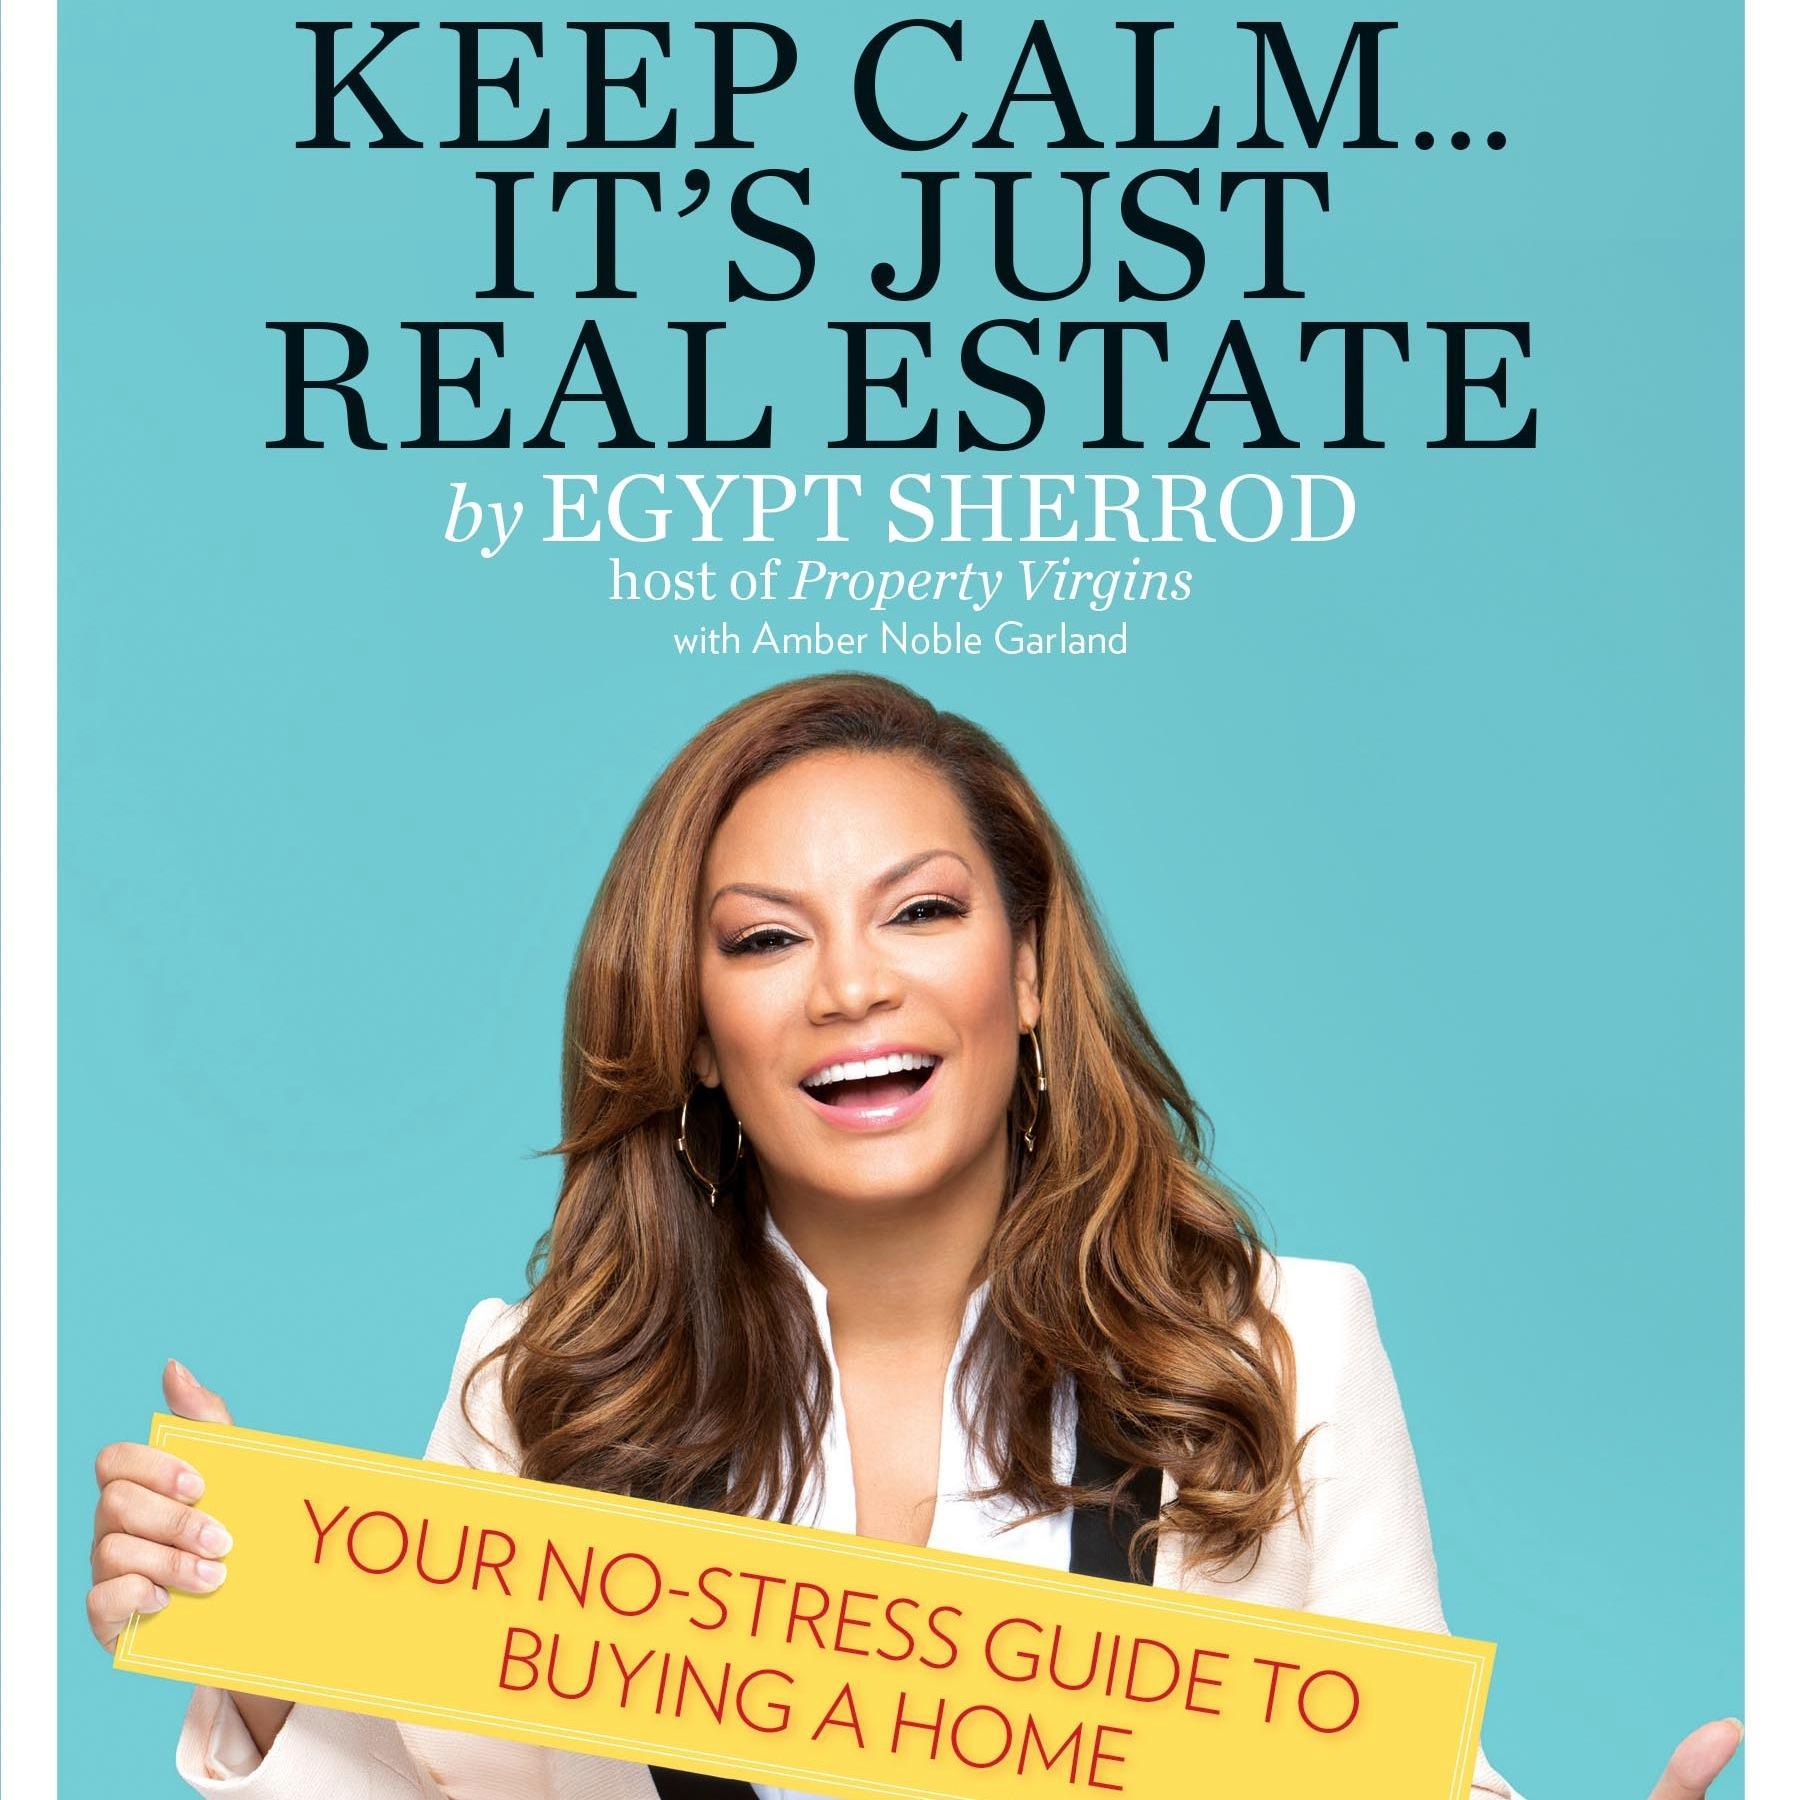 Keep Calm It's Just Real estate - MyFixitUpLIfe - Egypt Sherrod